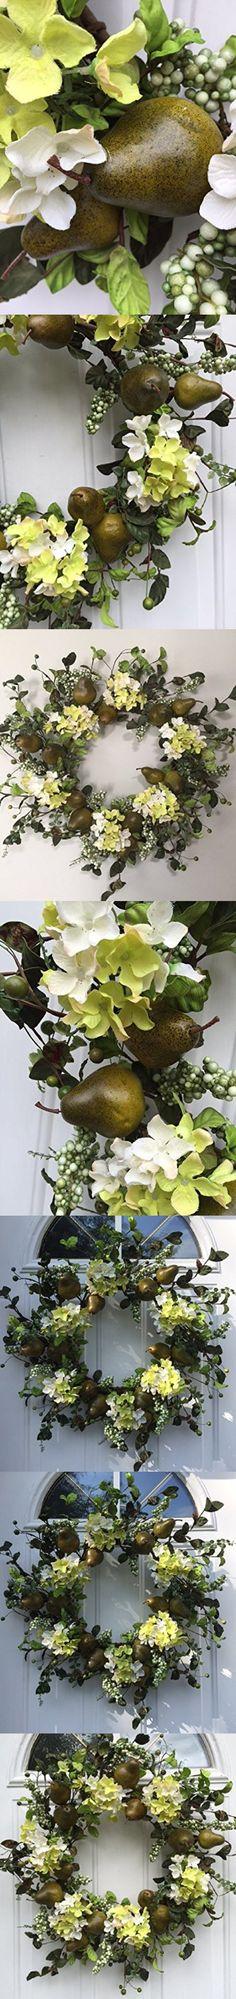 Sir Bartlett Silk Door Wreath 22 Inches Handmade With Artificial Green Pears And Hydrangeas Display